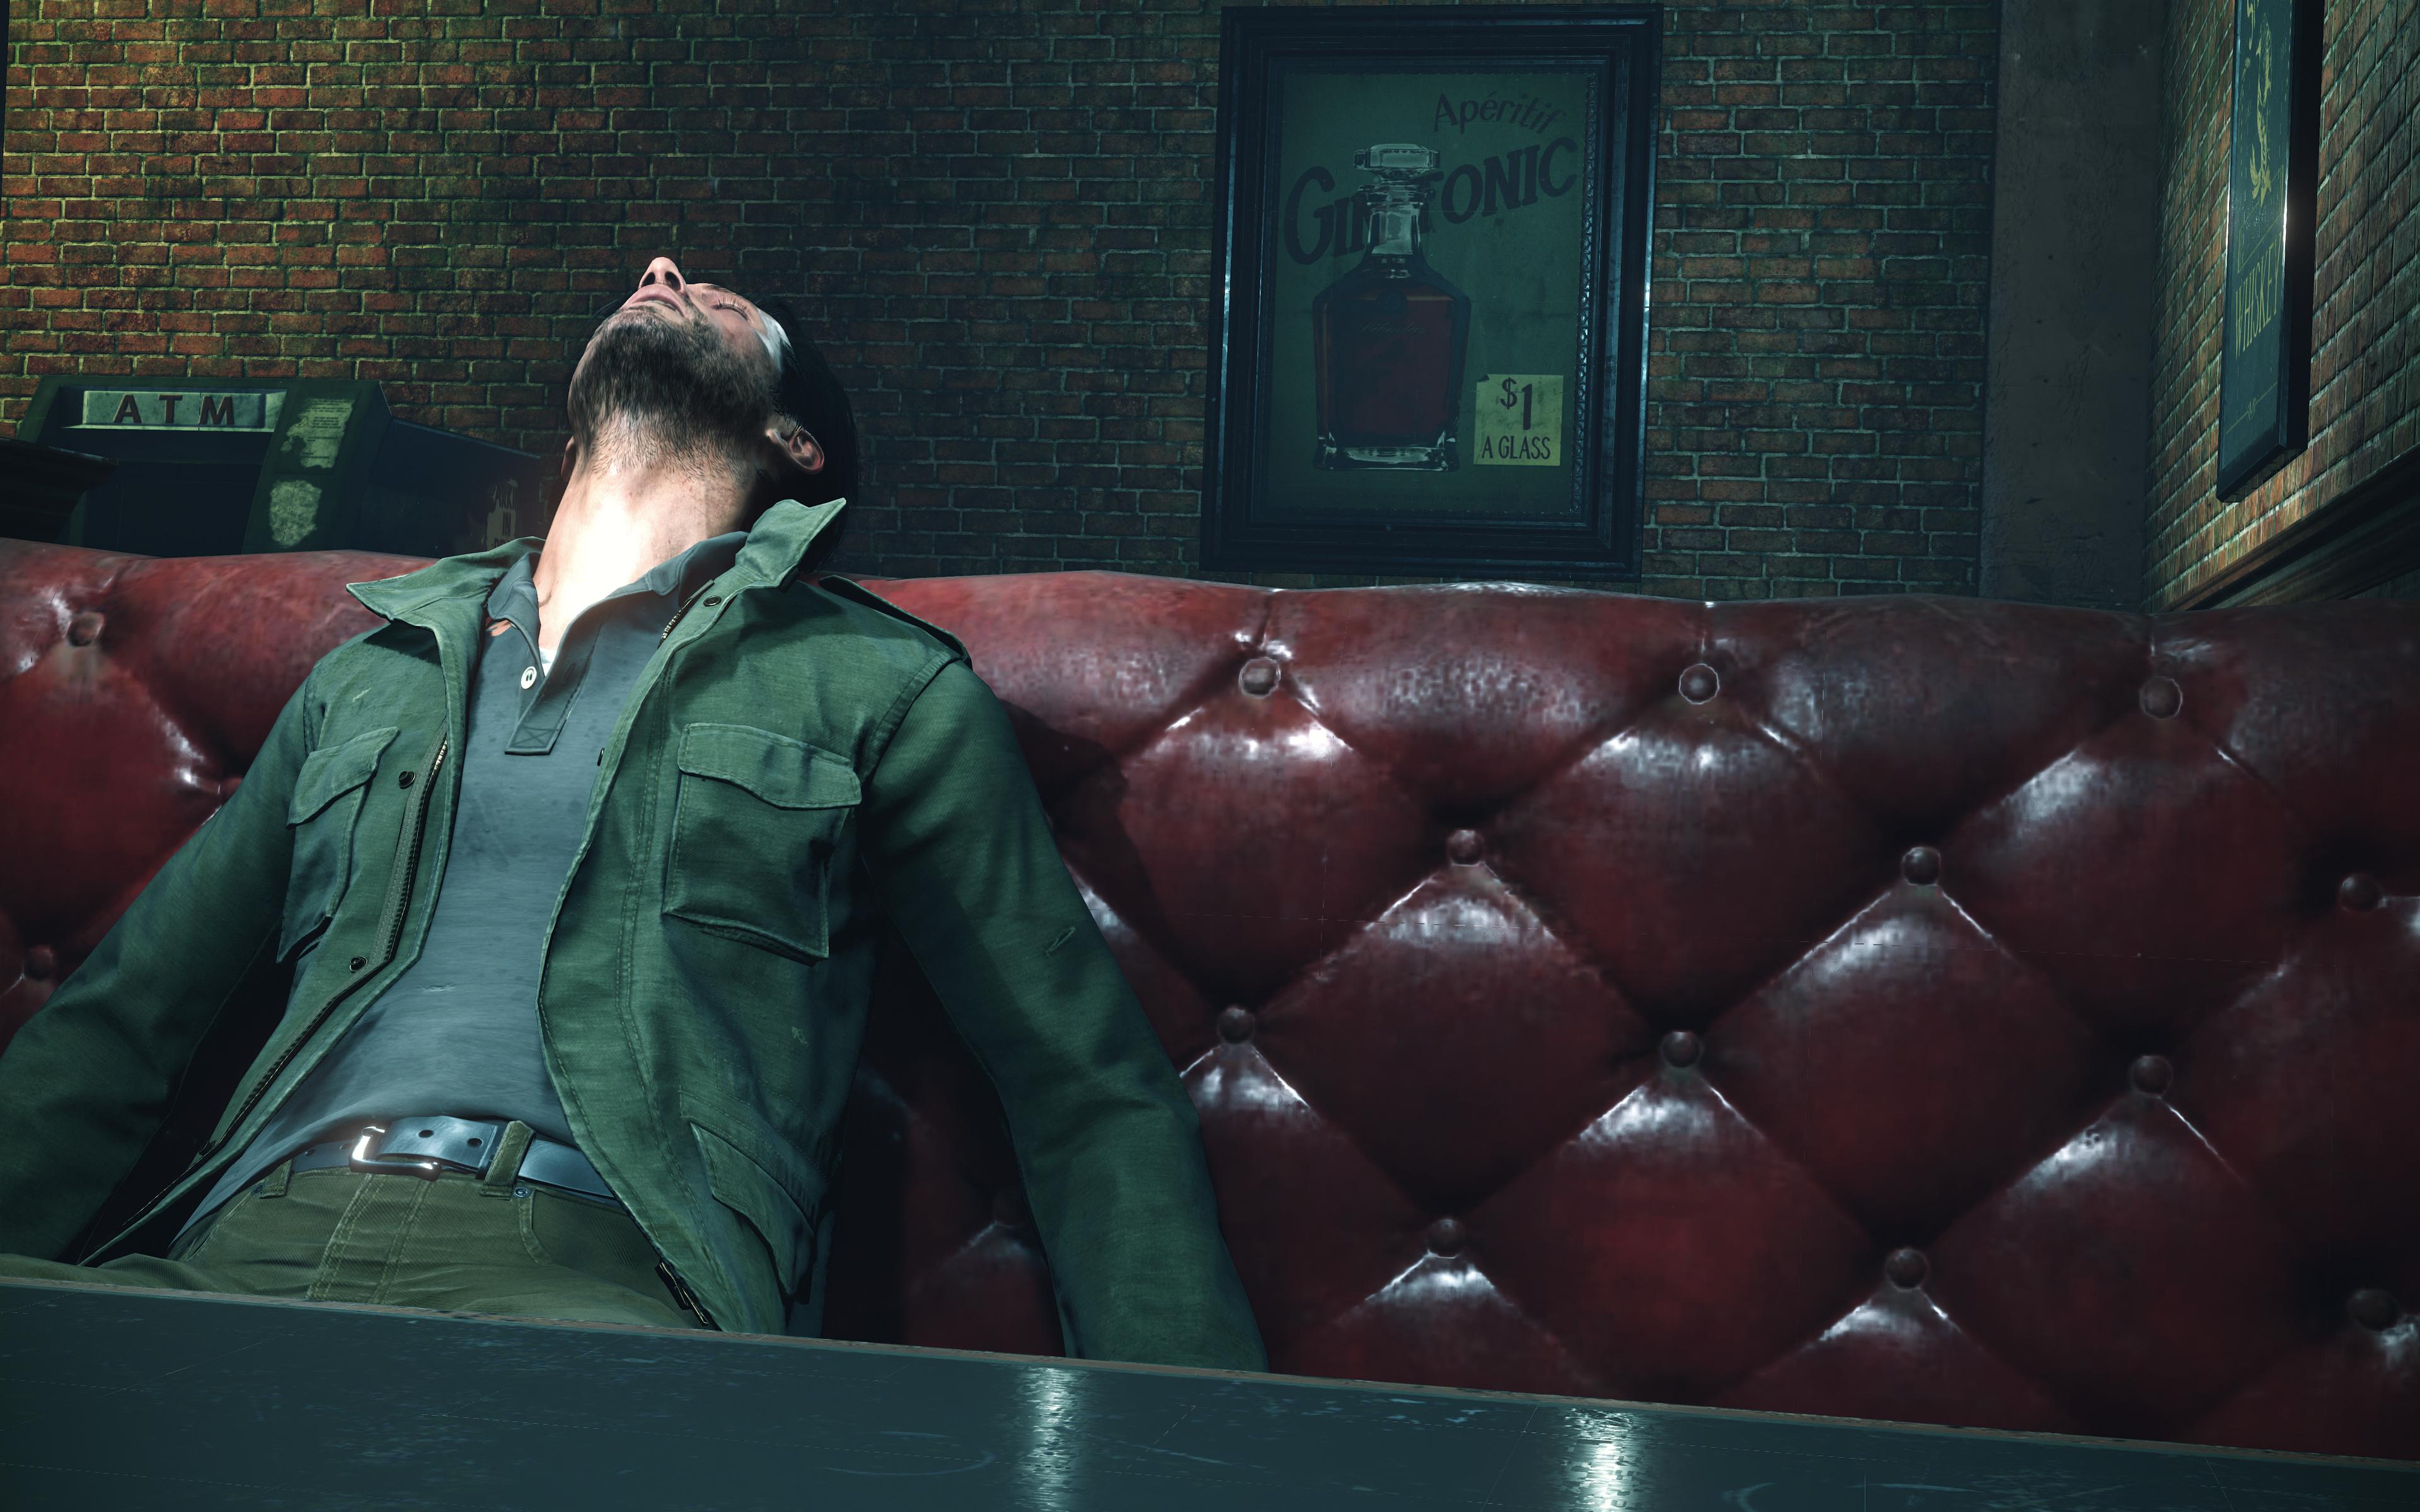 Man slumped in chair